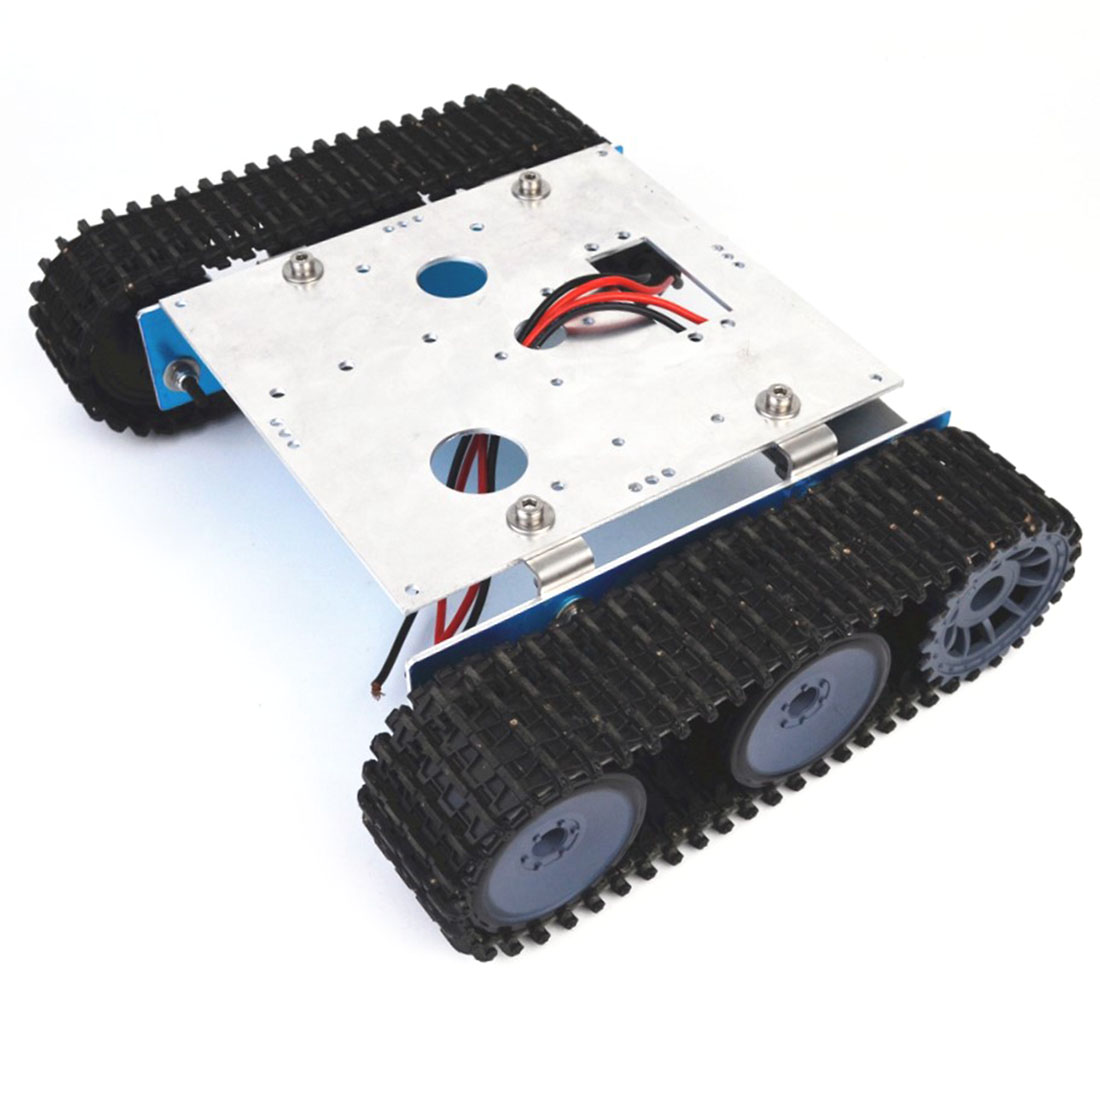 Aluminium Alloy DIY Tank Robot Caterpillar Vehicle Platform Chassis Assembly Kit For Arduino